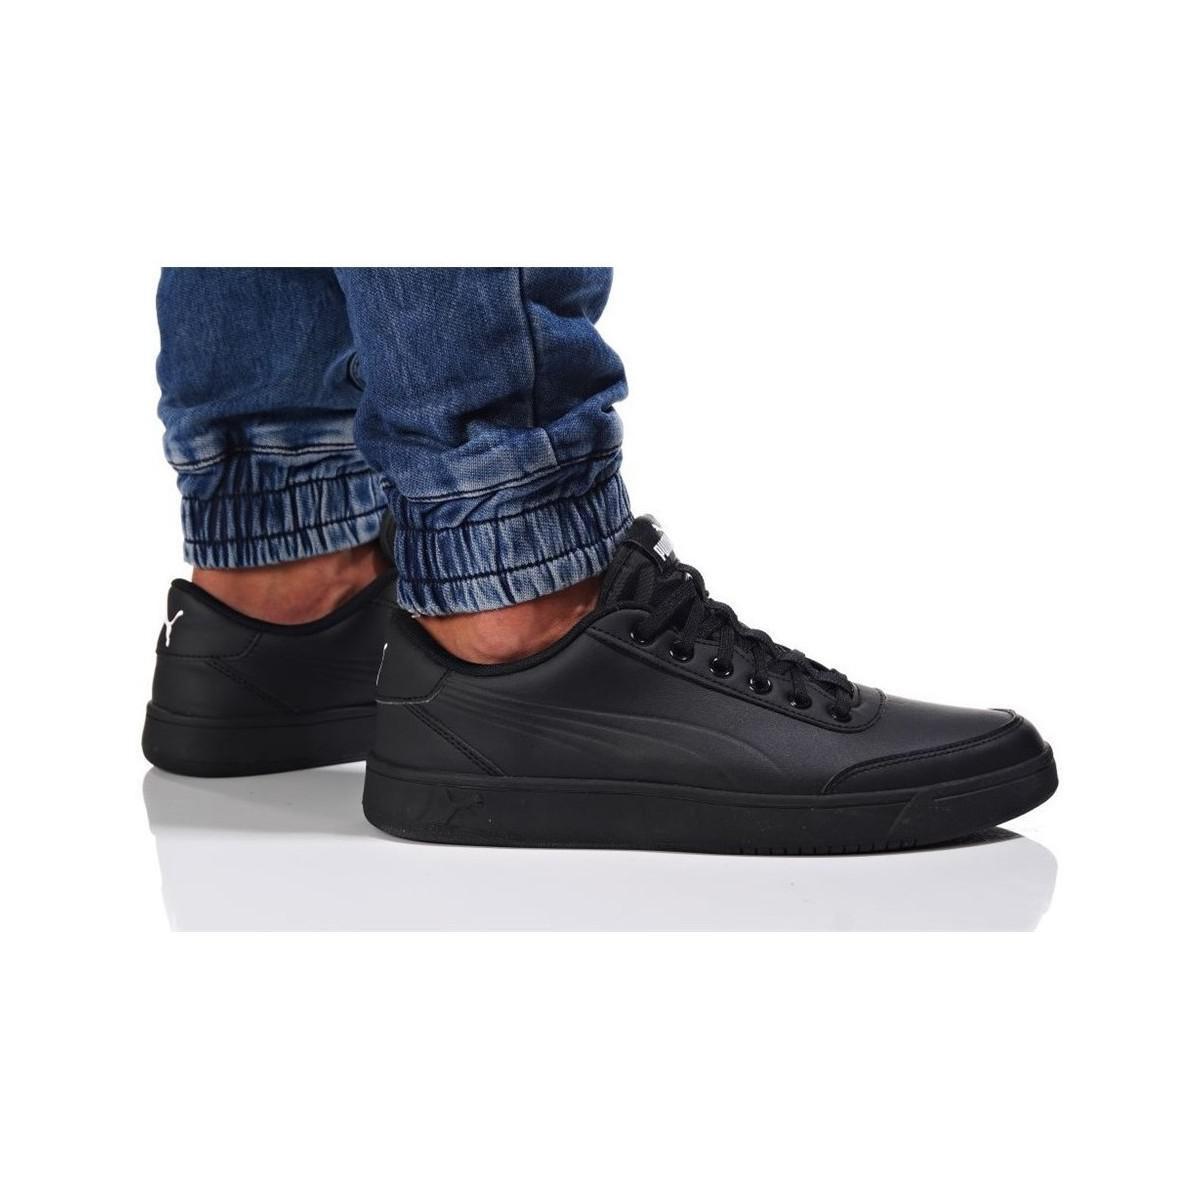 Lyst Puma Court Breaker L Mono Men S Shoes Trainers In